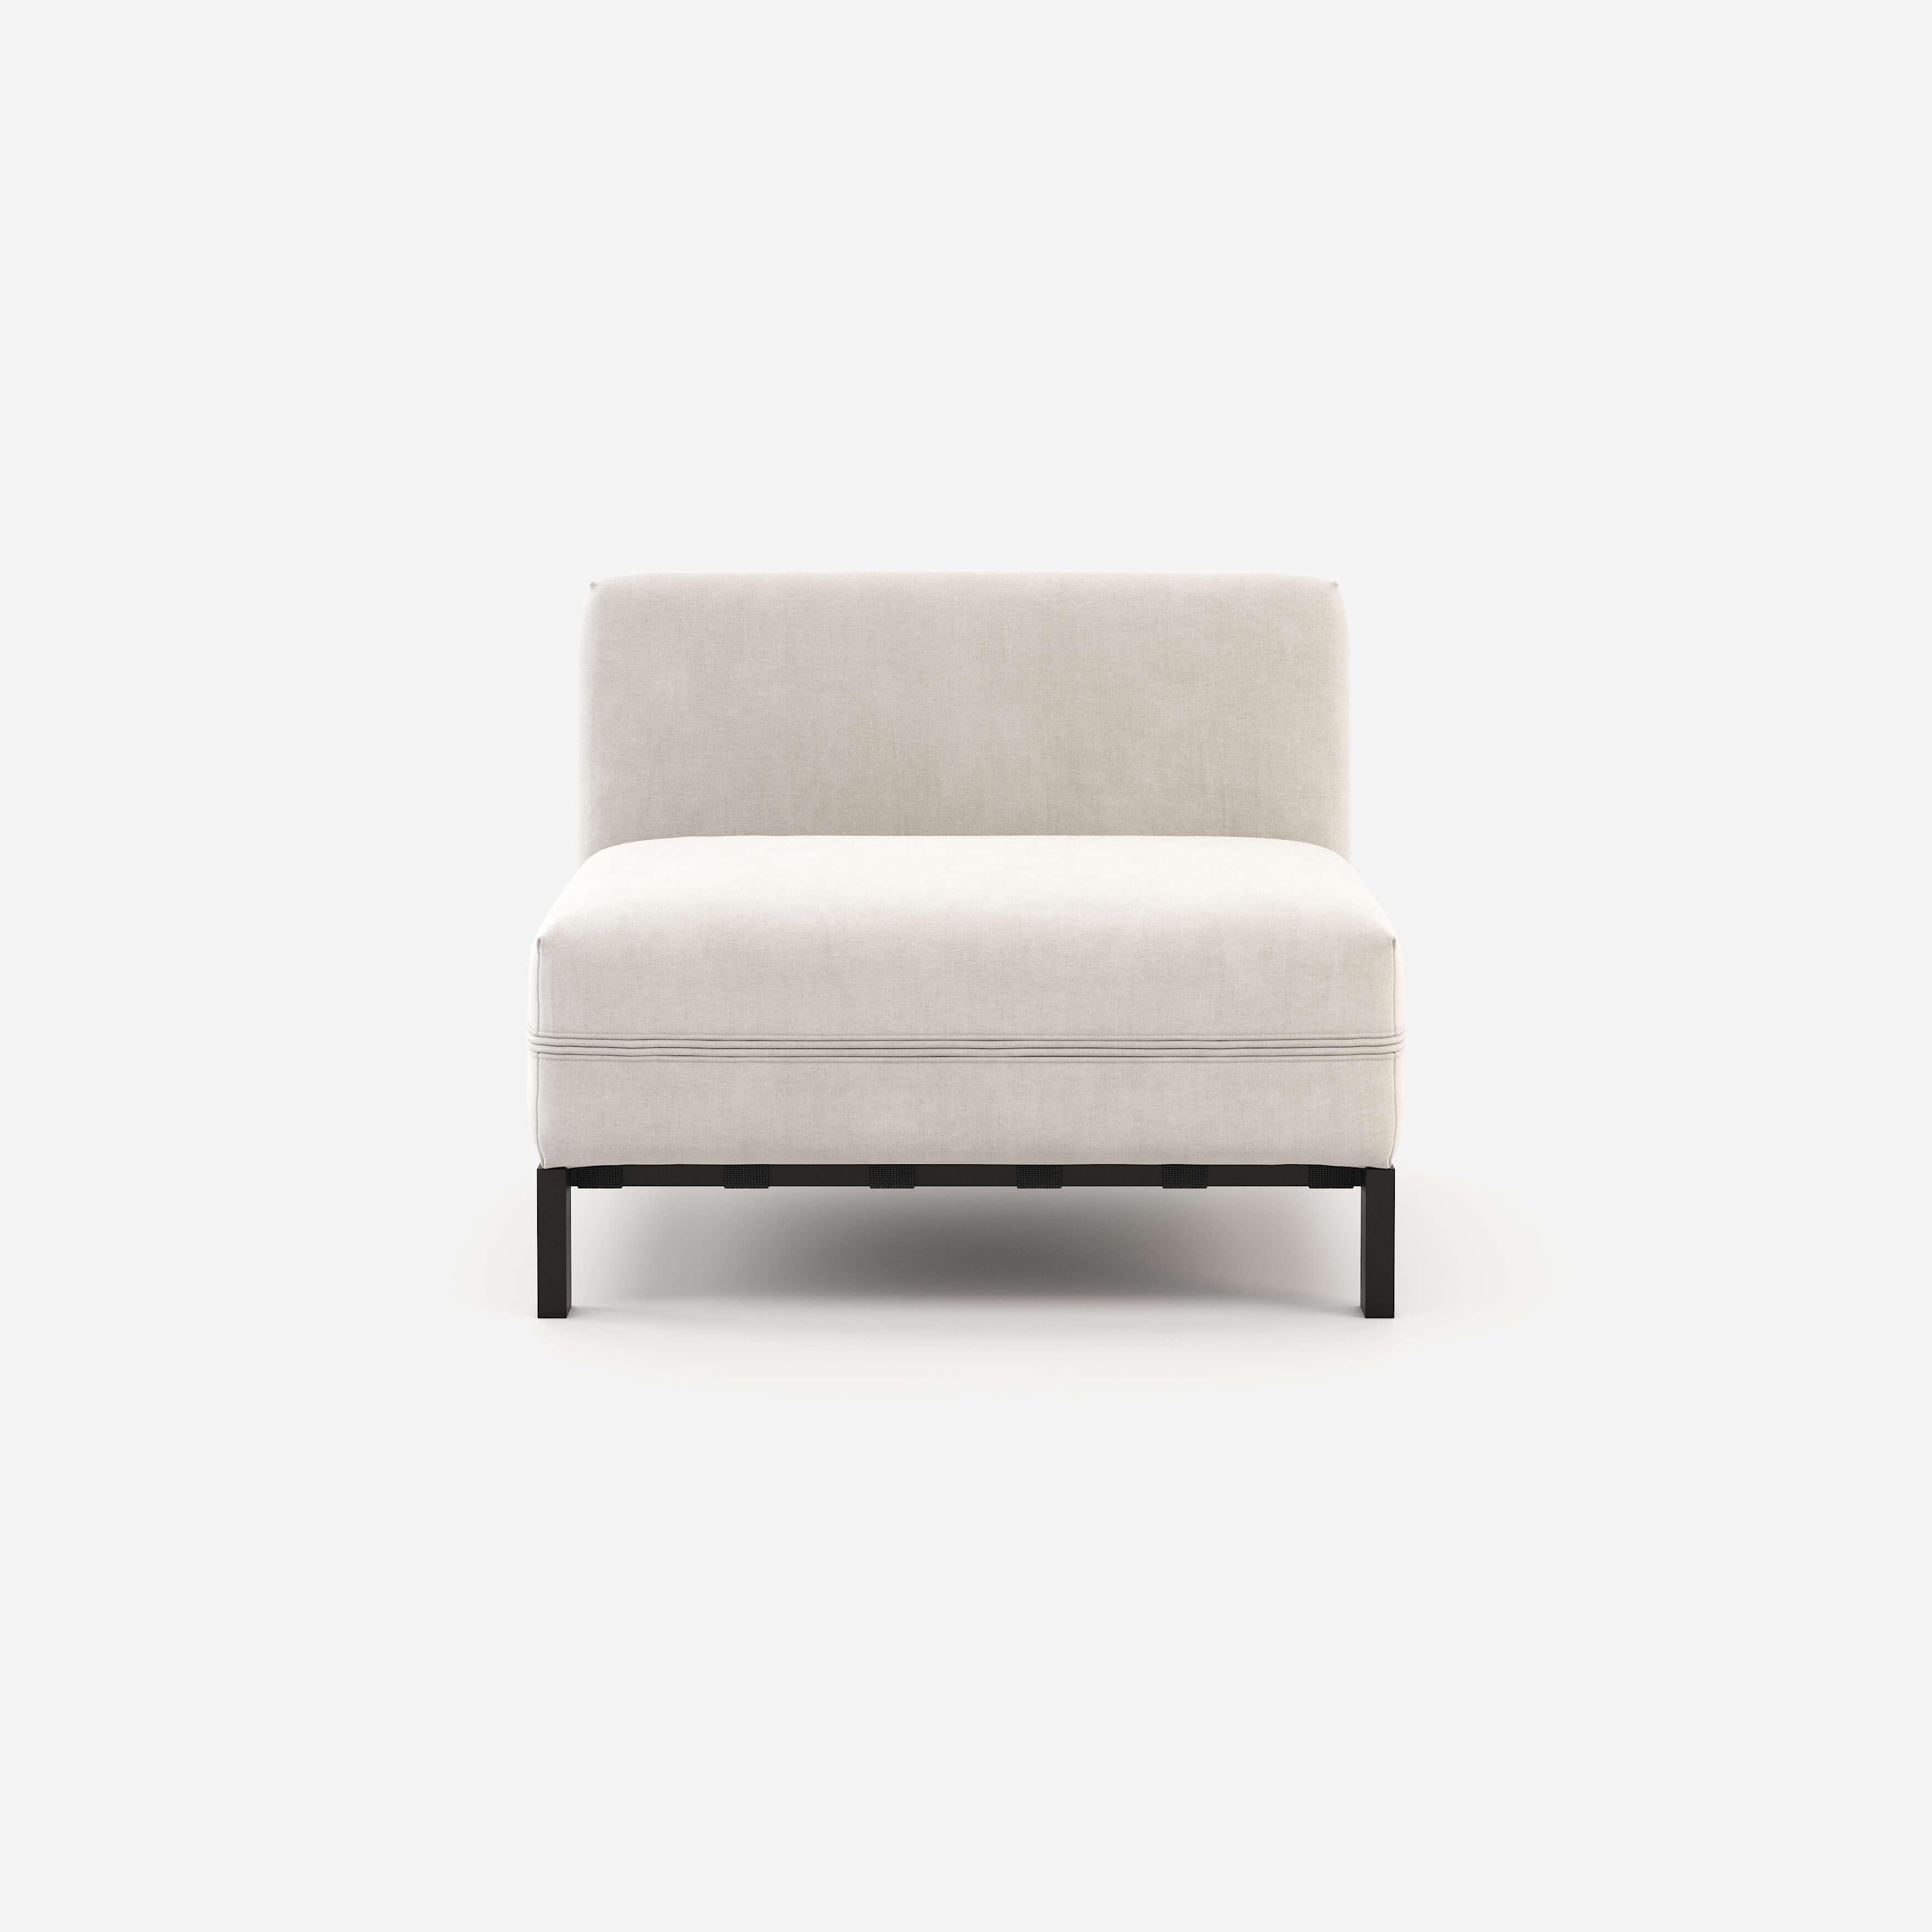 Bondi Middle Sofa-interior-design-home-decor-furniture-white-domkapa-upholstery-2